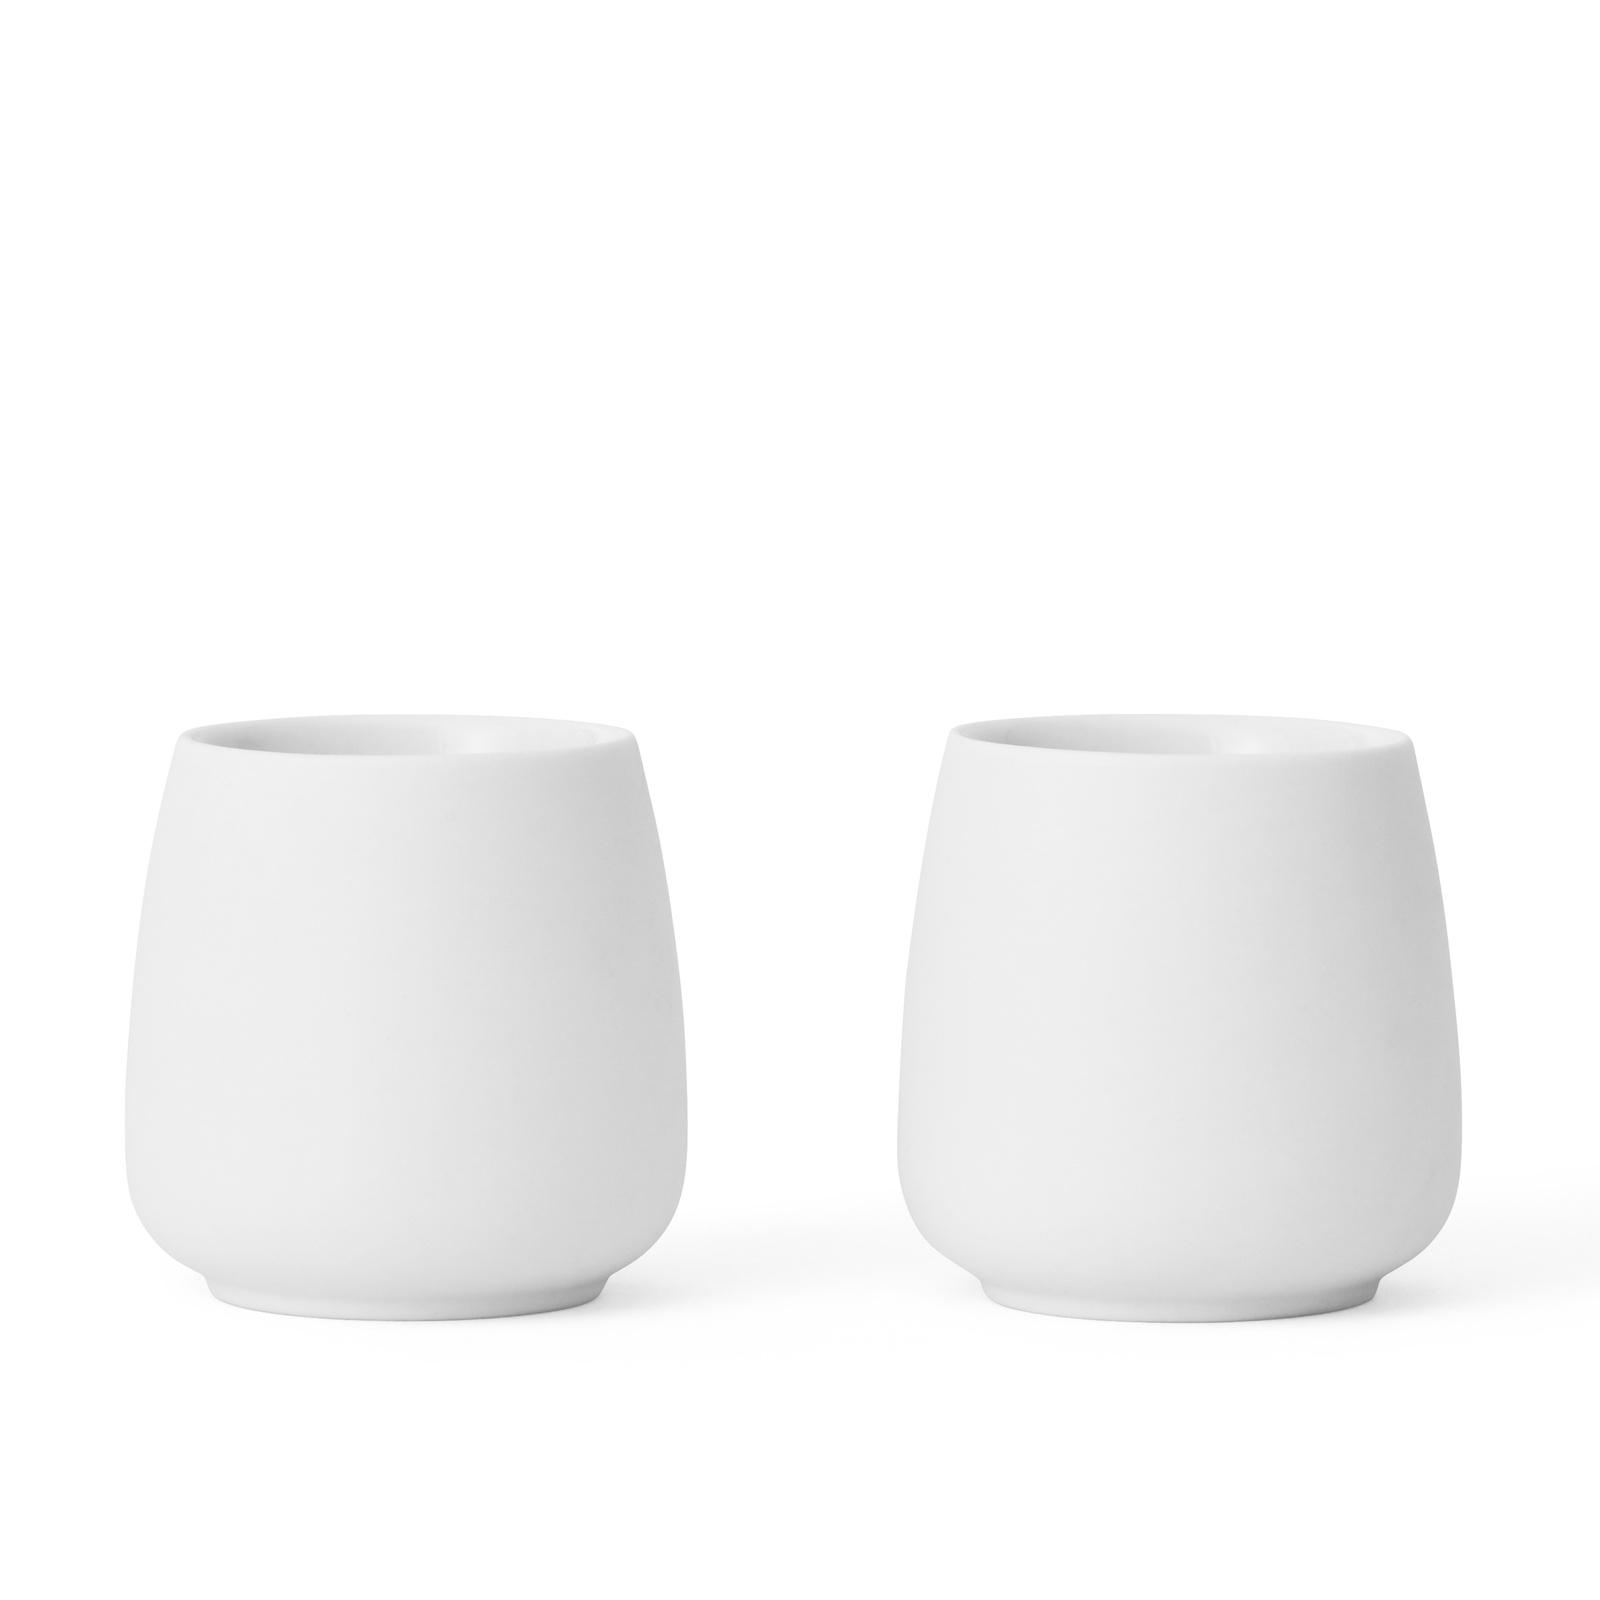 Чайный стакан Viva scandinavia Nicola, V35802, белый, 0,08 л, 2 шт